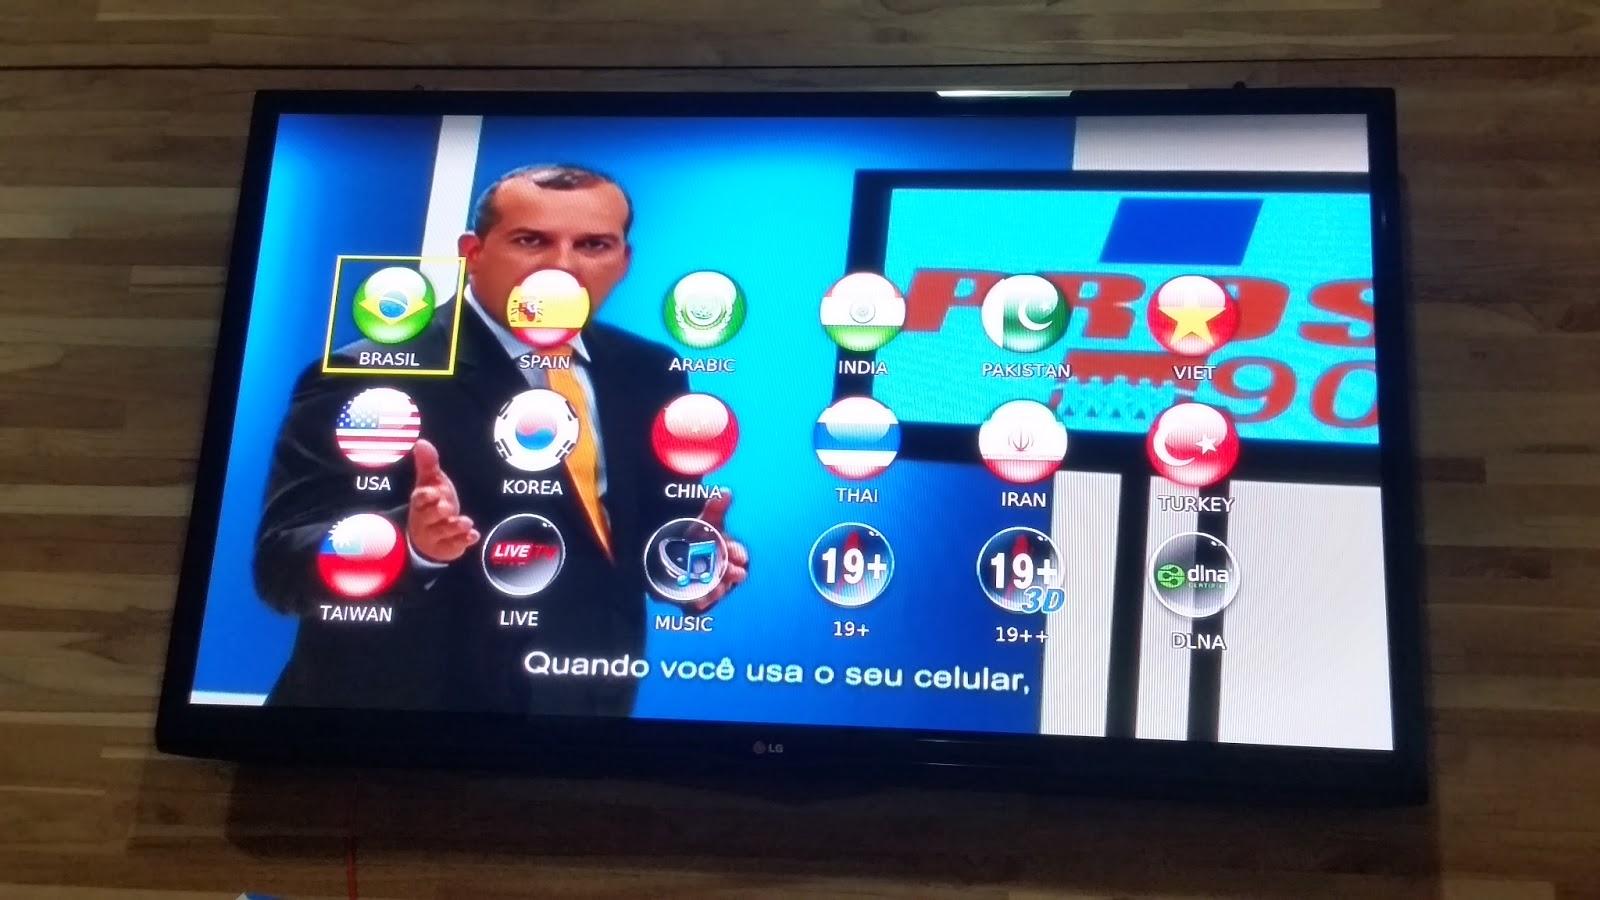 CINEBOX MAESTRO PIN CODE IKS ATIVADO - IPTV ON DEMAND